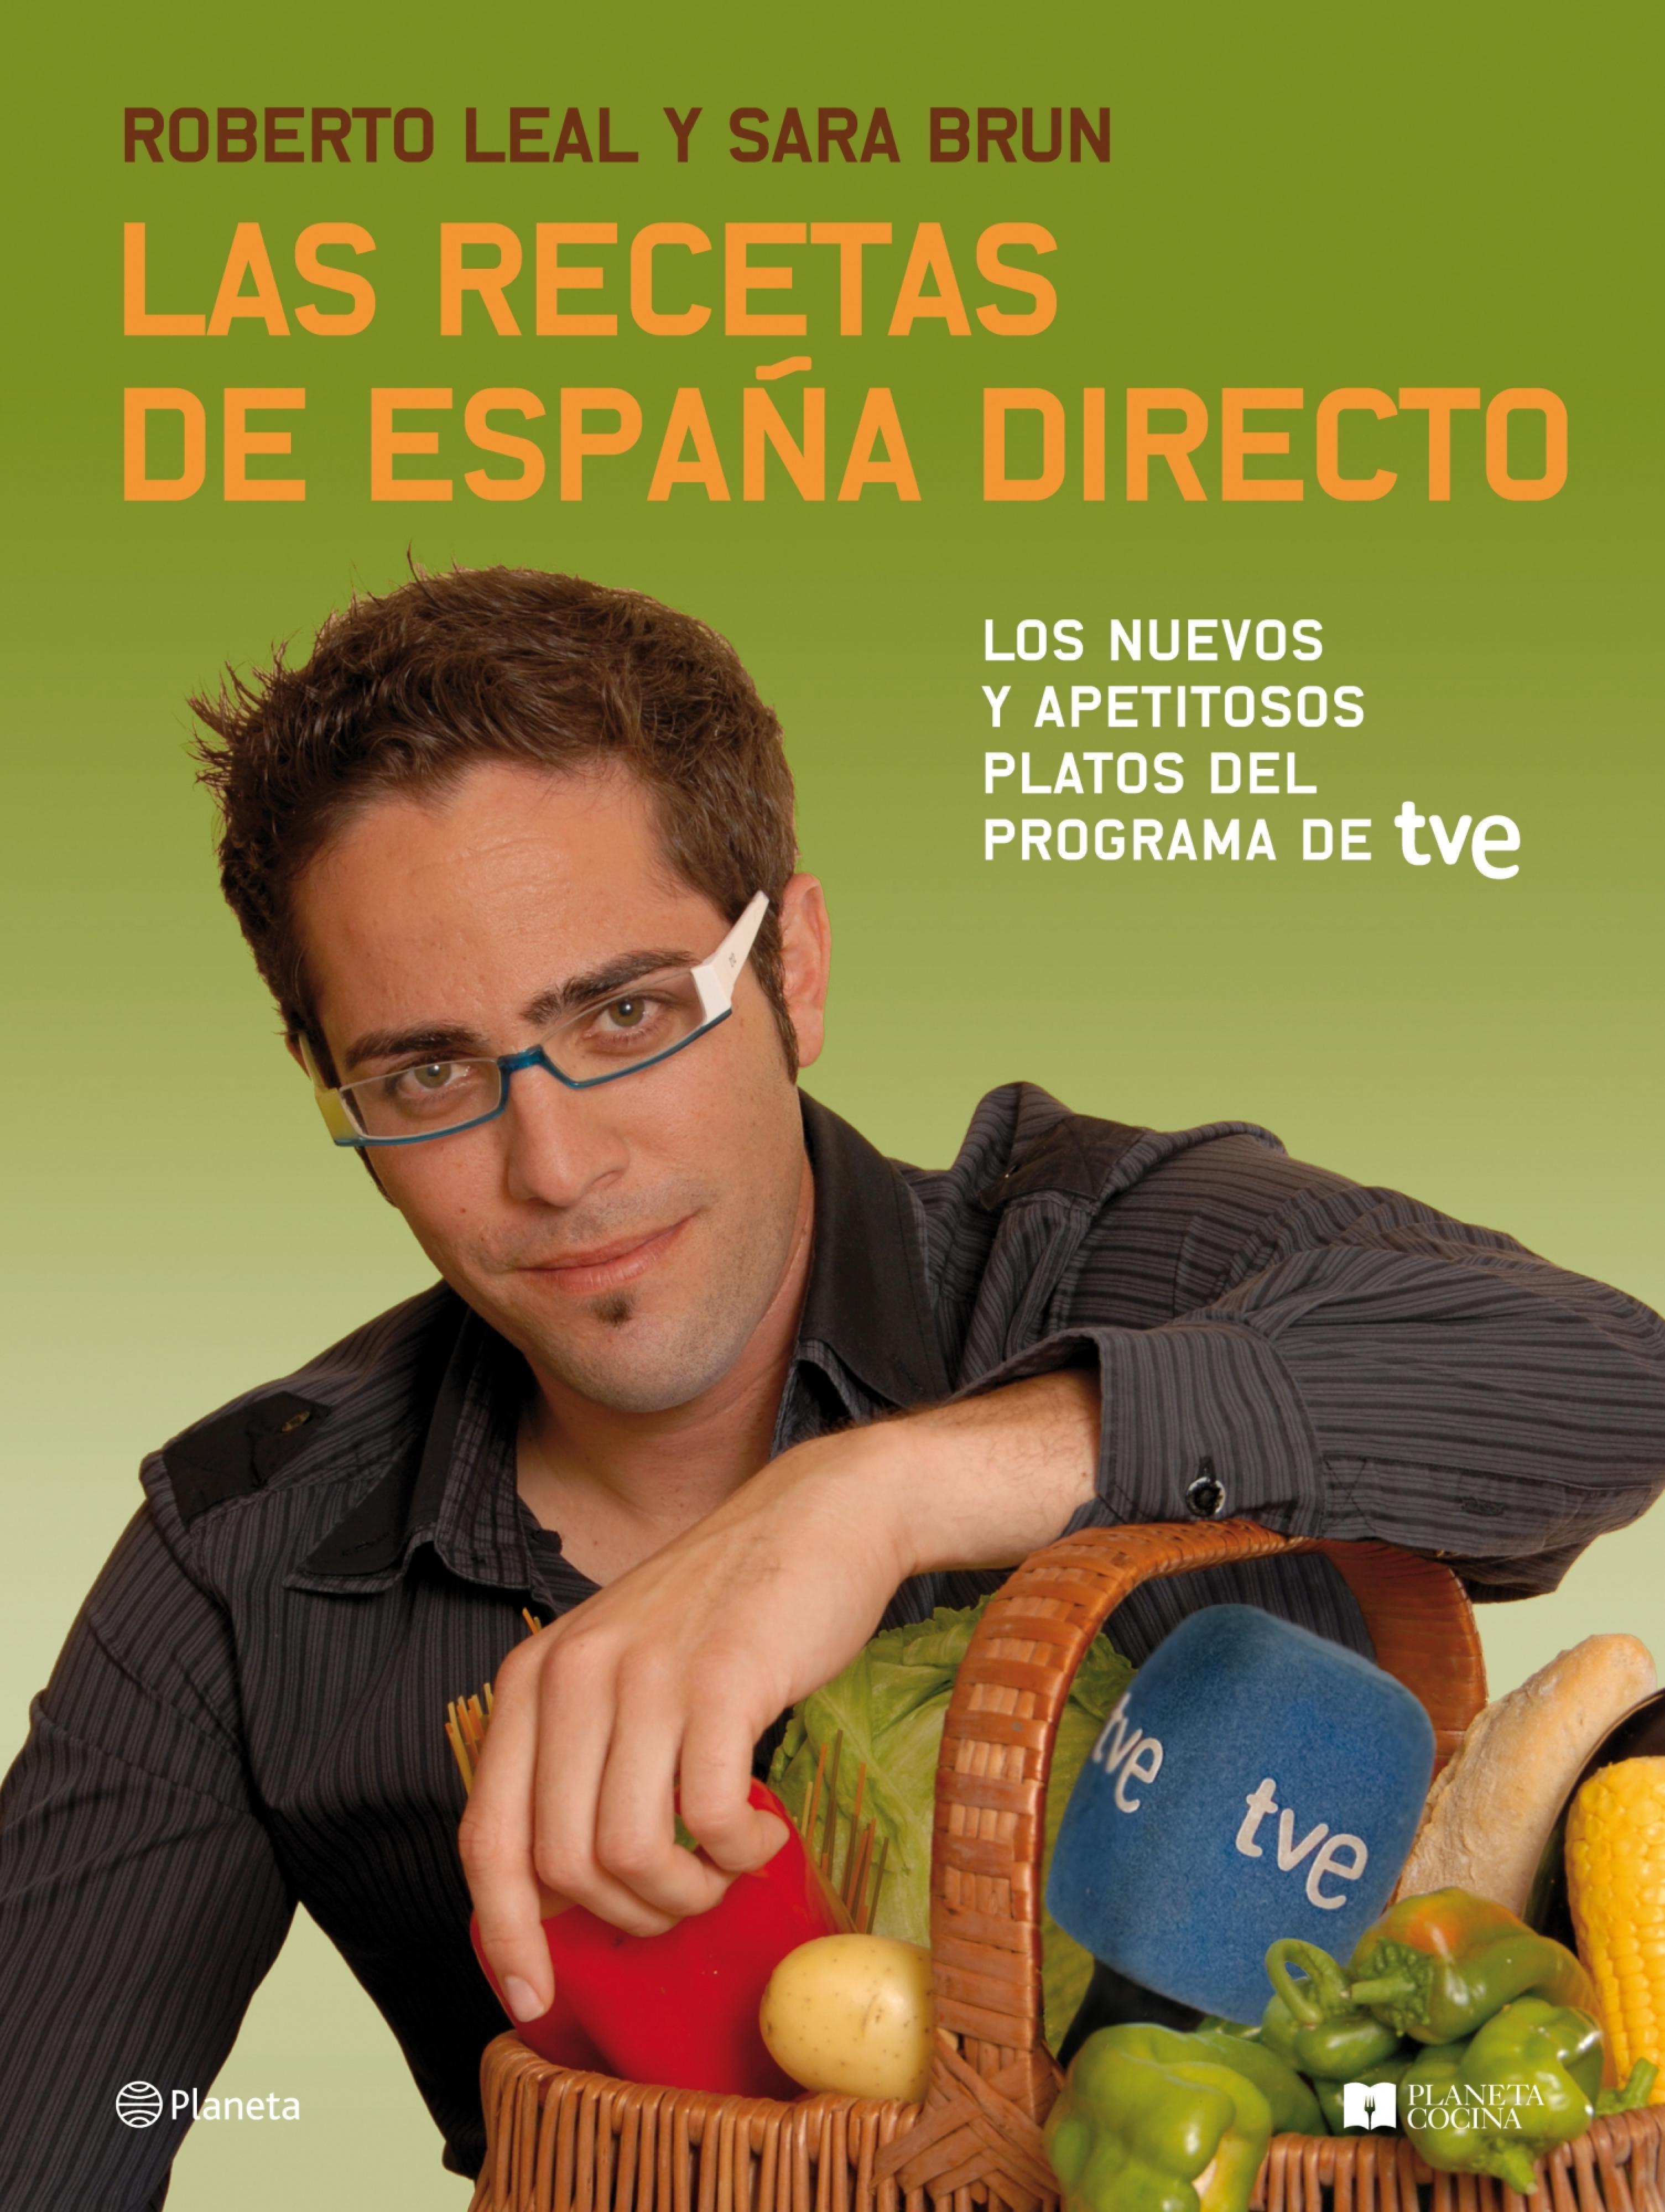 Recetas De Cocina De España Directo | Las Recetas De Espana Directo Ebook Sara Brun Descargar Libro